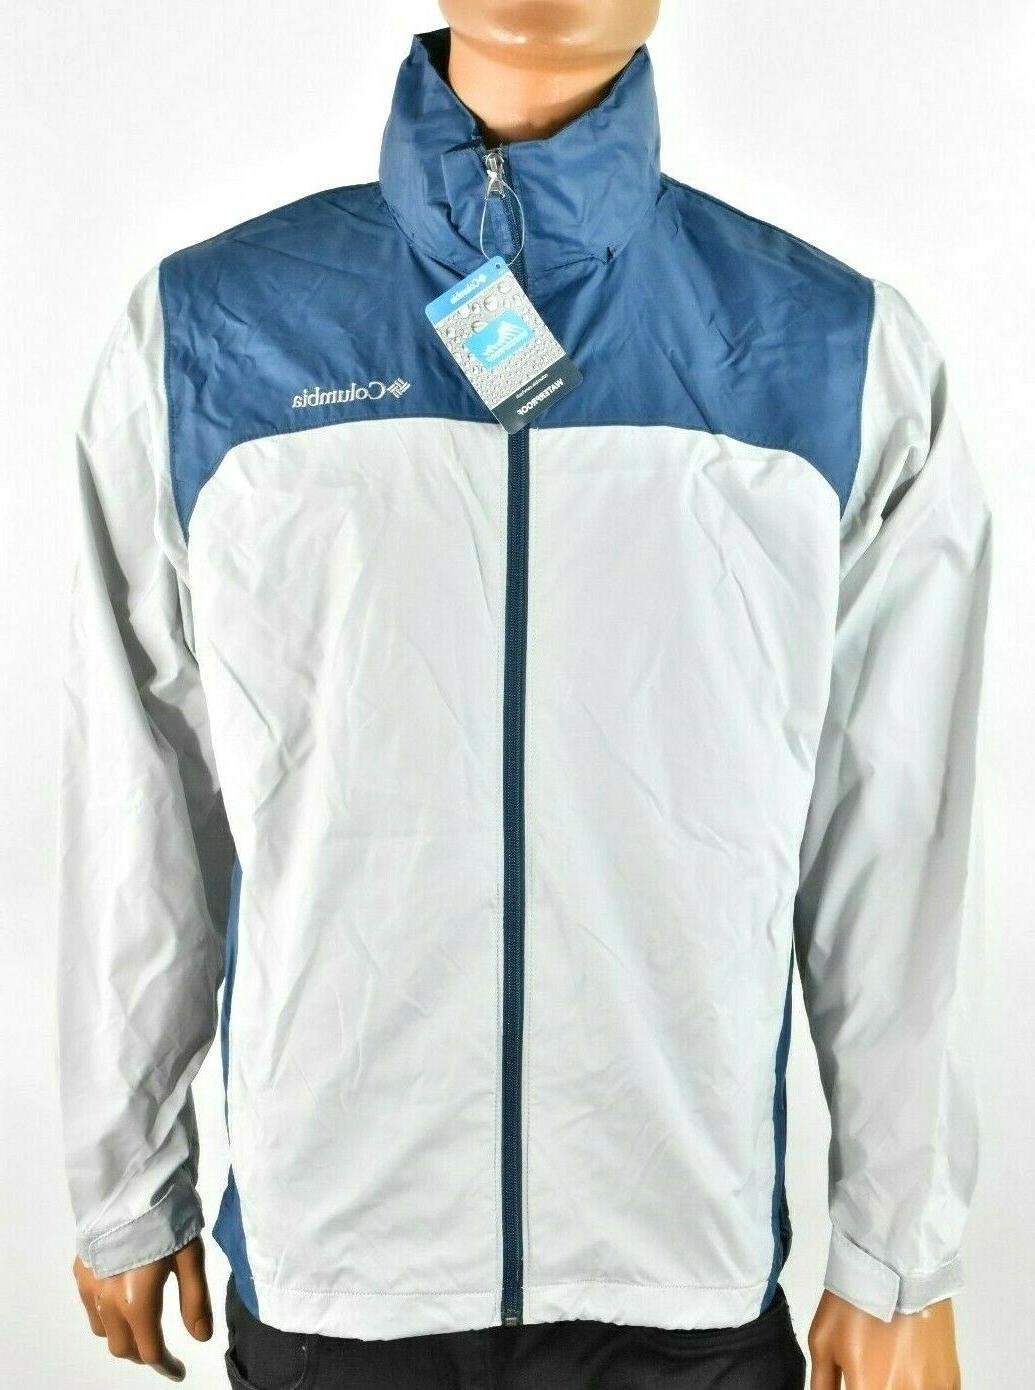 glennaker lake rain jacket s m xl